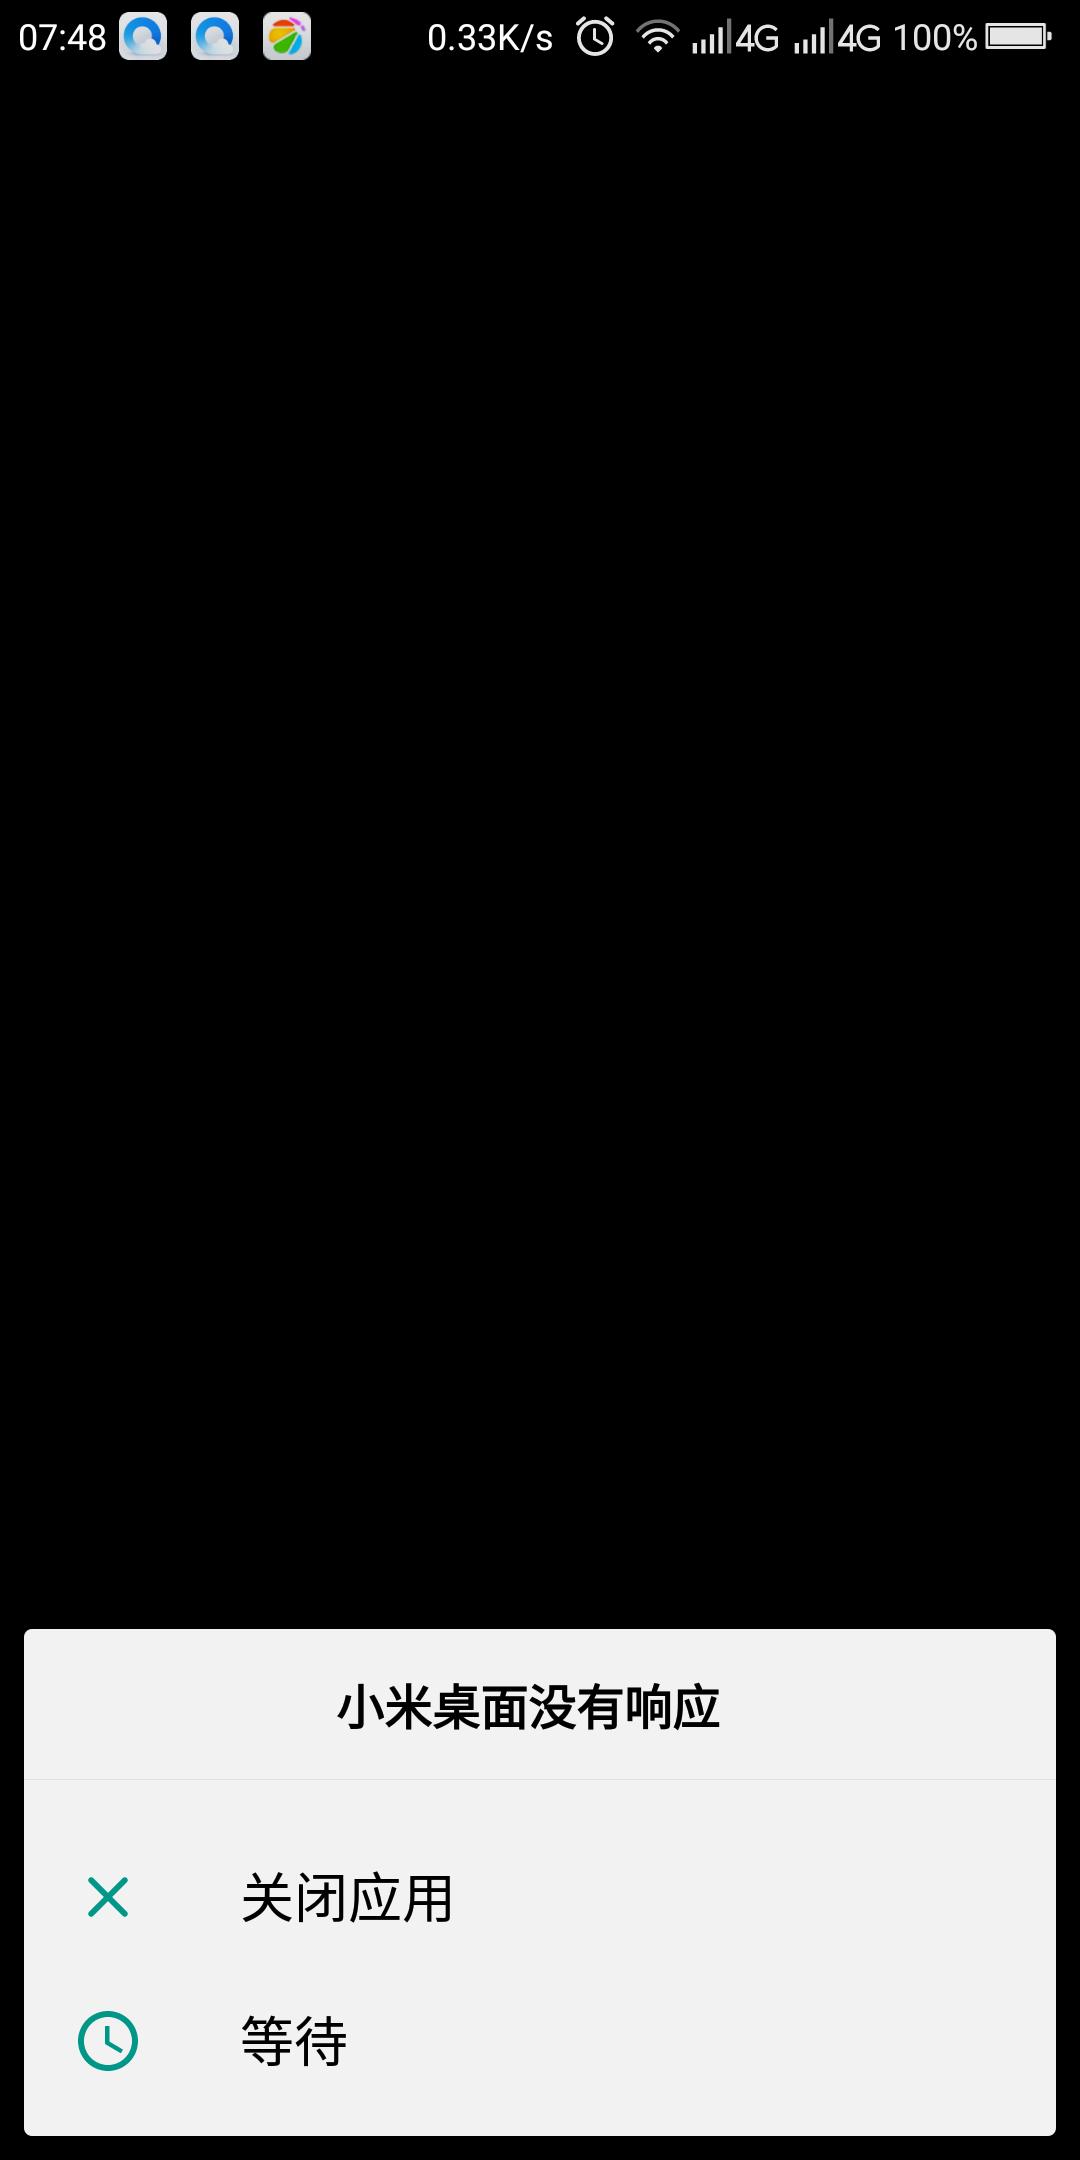 Screenshot_2018-10-05-07-48-48.png